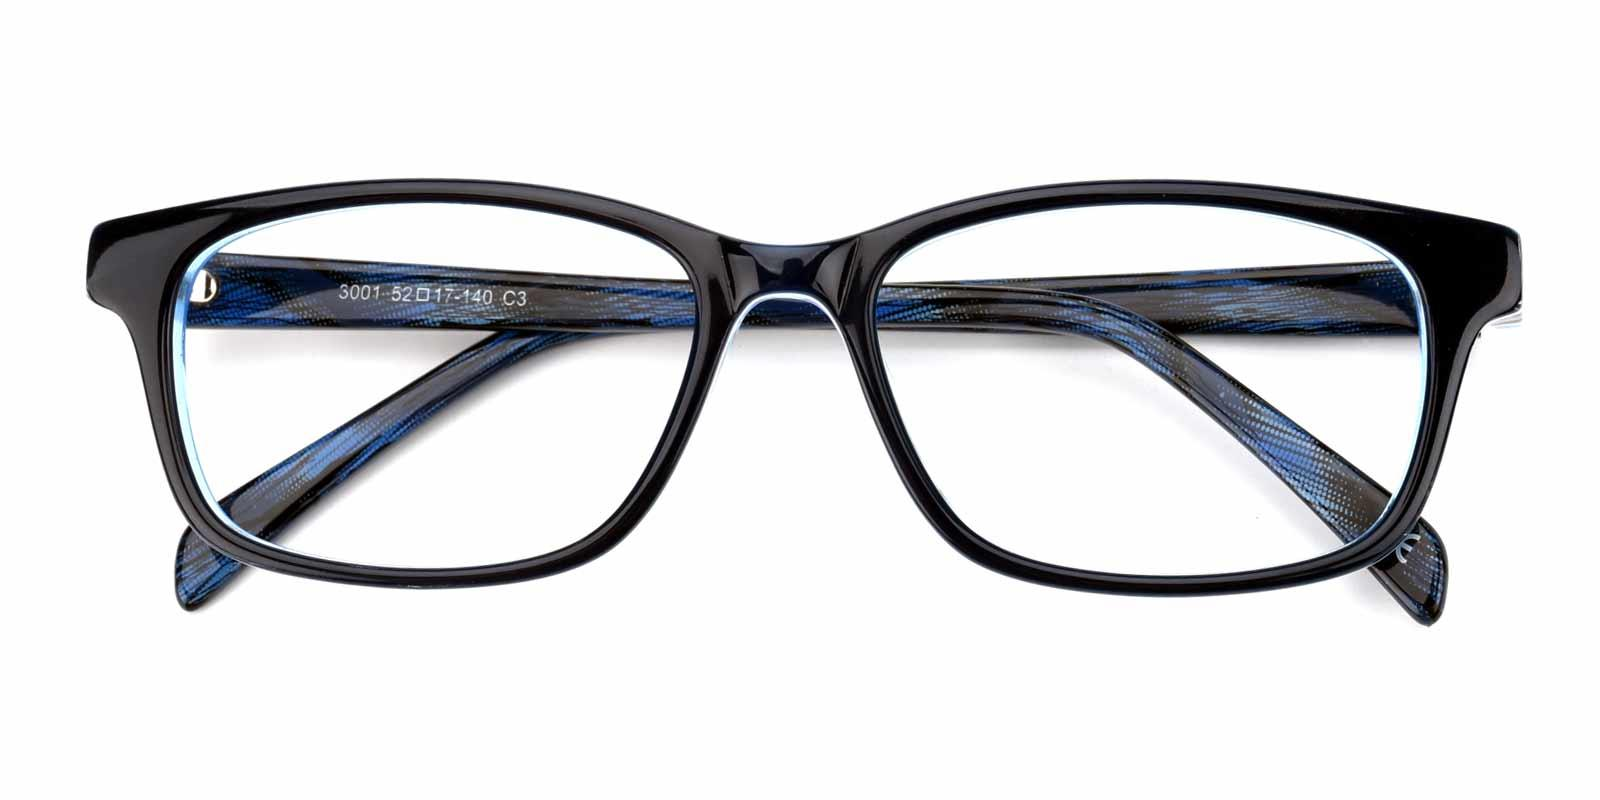 Carl-Blue-Rectangle-Acetate-Eyeglasses-detail